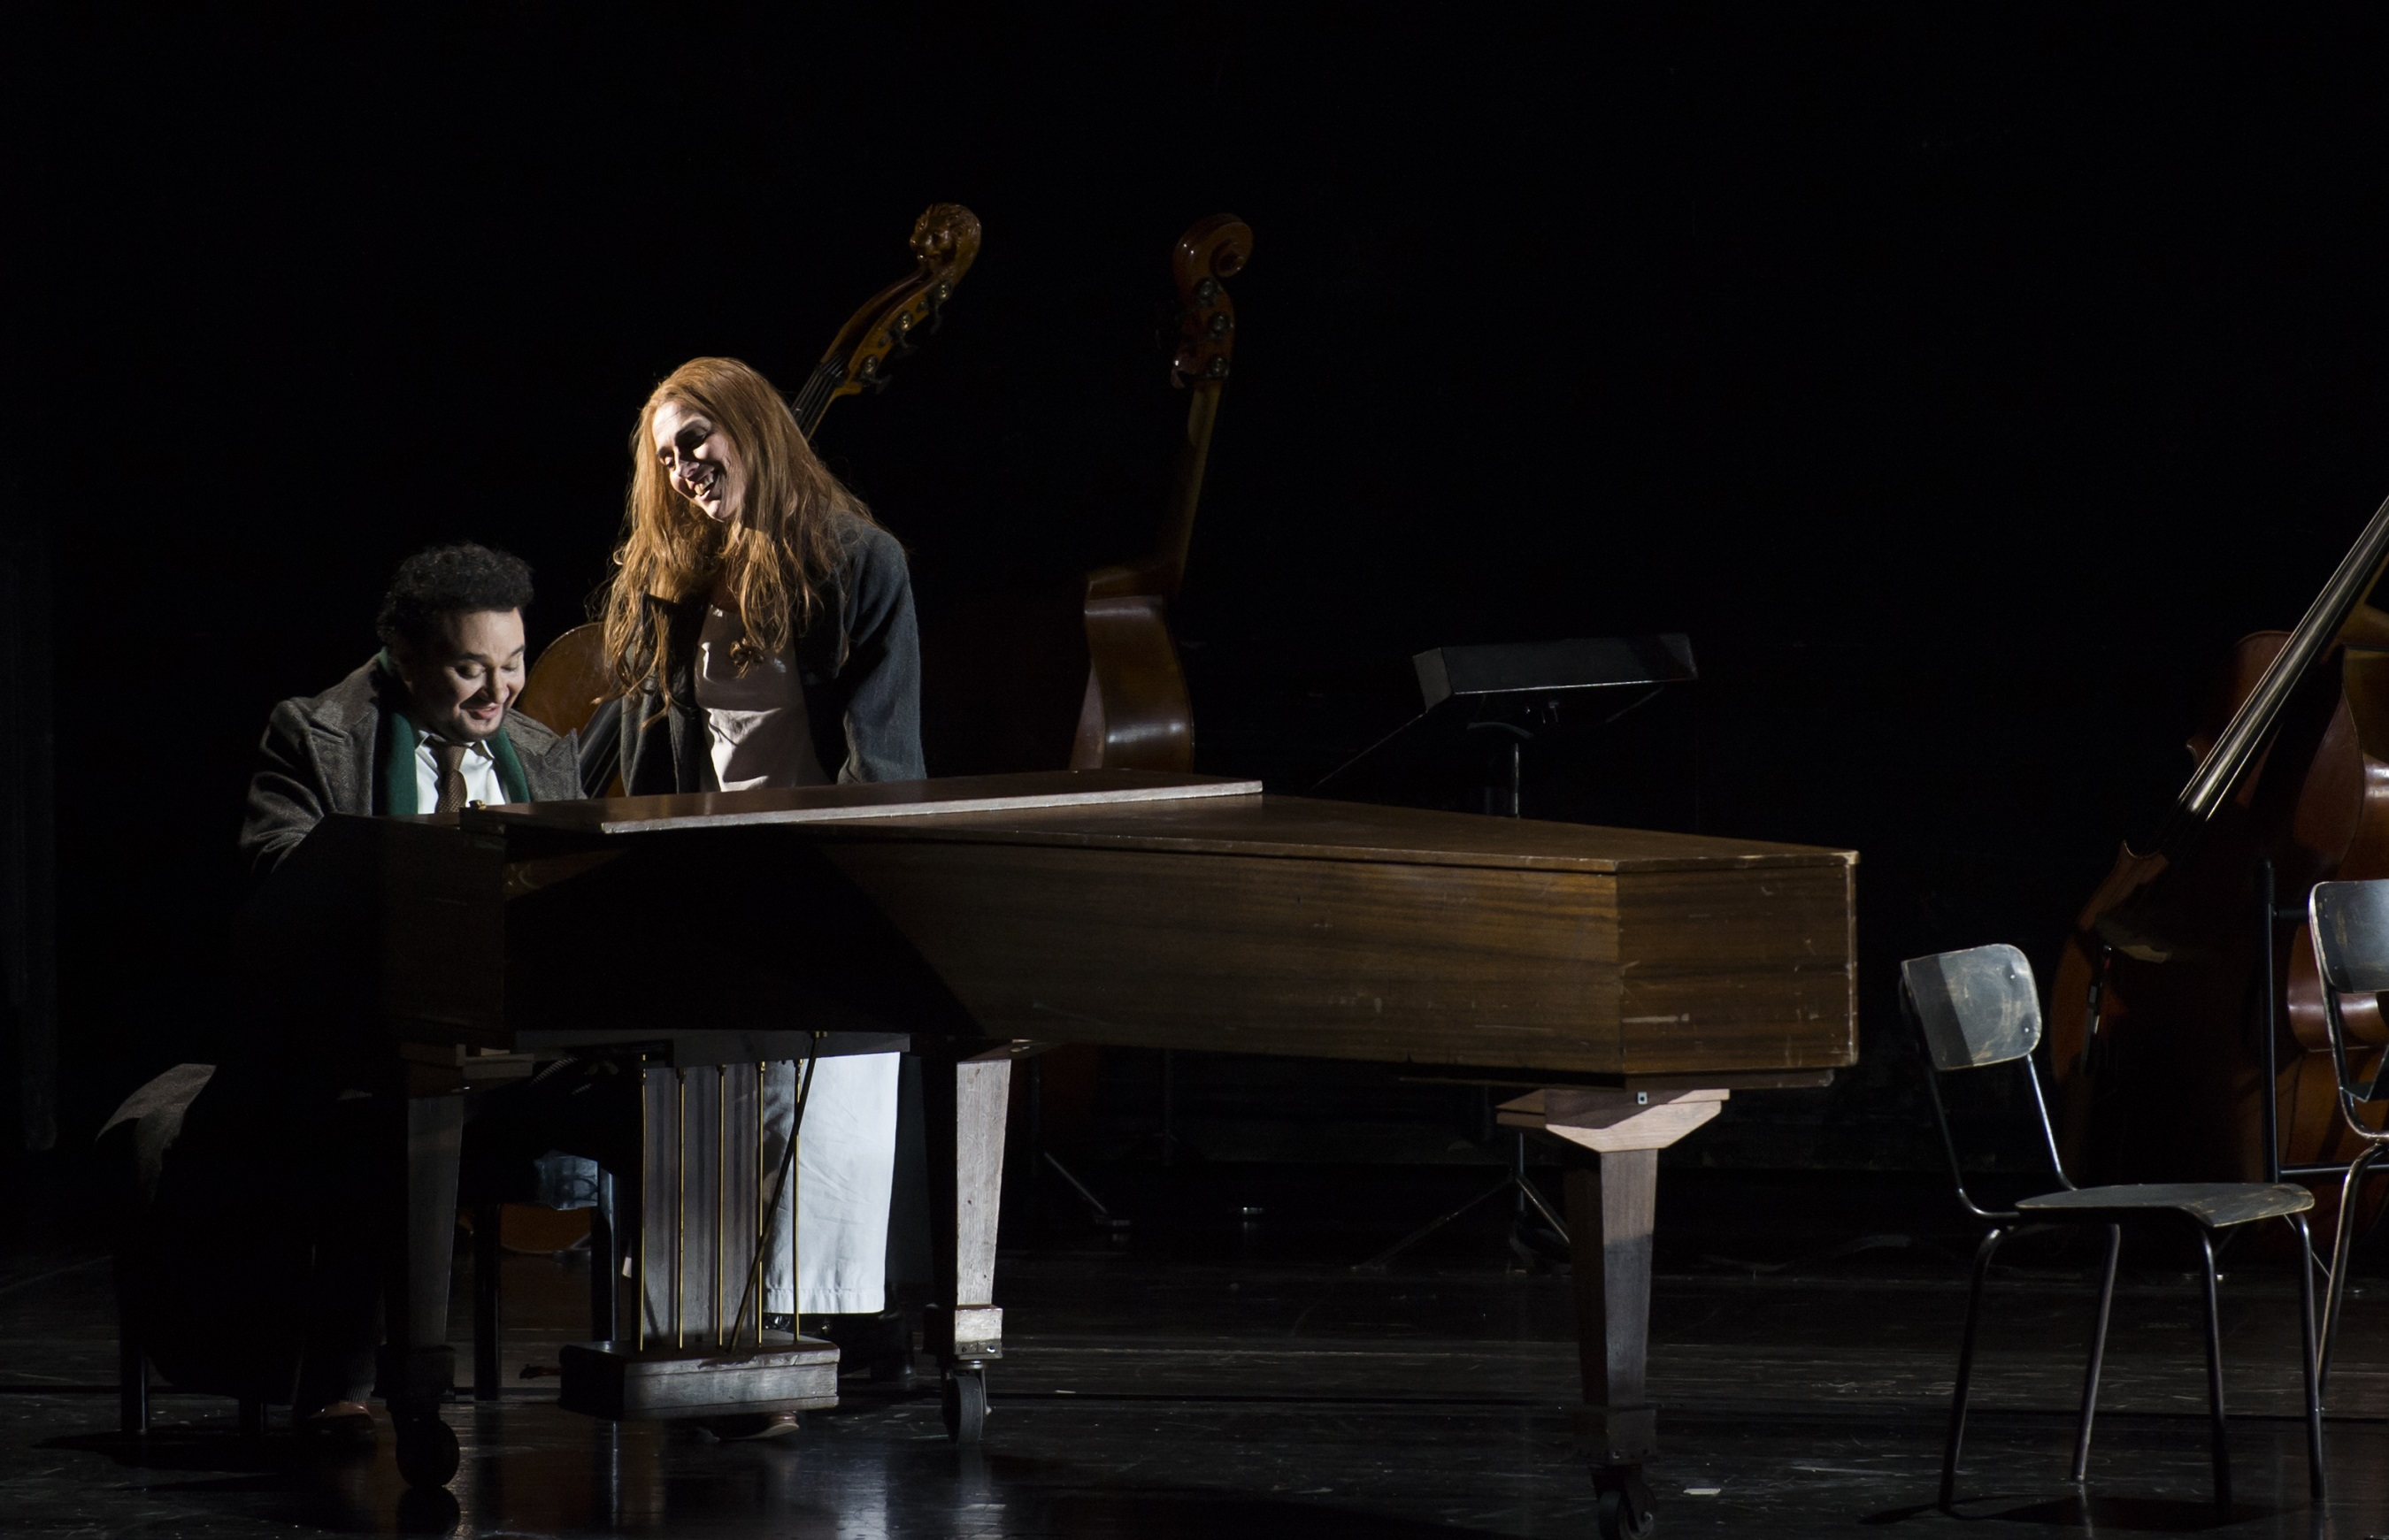 """Les contes d'Hoffmann"", octobre 2016 à l'Opéra Bastille : Ramón Vargas (Hoffmann) - Ermonela Jaho (Antonia) / © Julien Benhamou (ONP)"